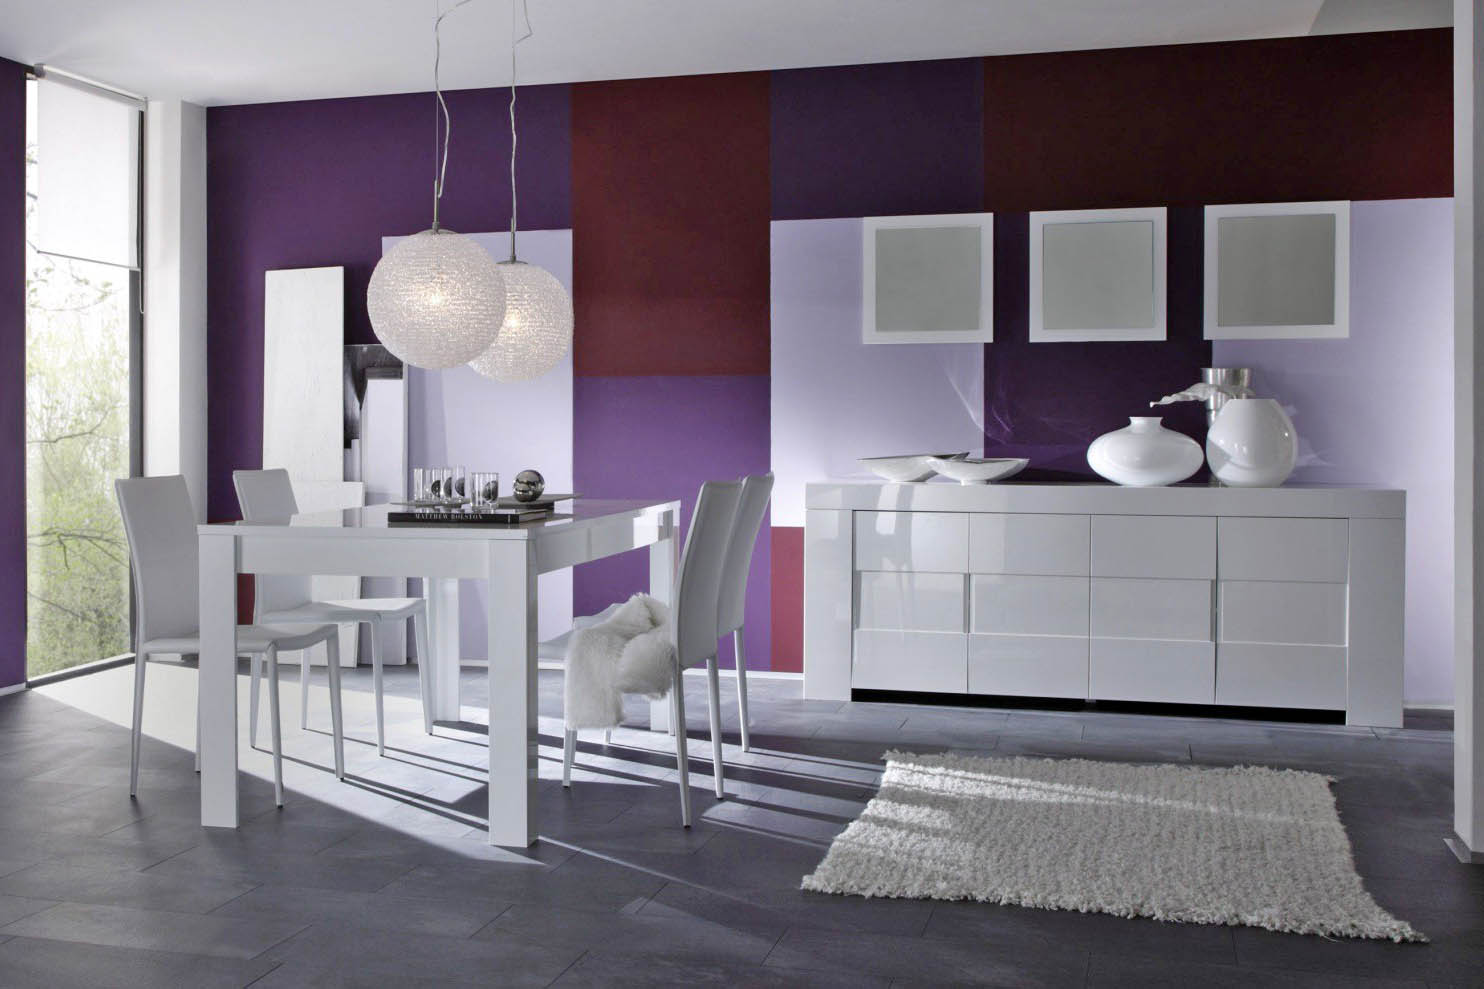 Salle manger meubl et design blanc meuble et - Meuble salle a manger laque blanc ...